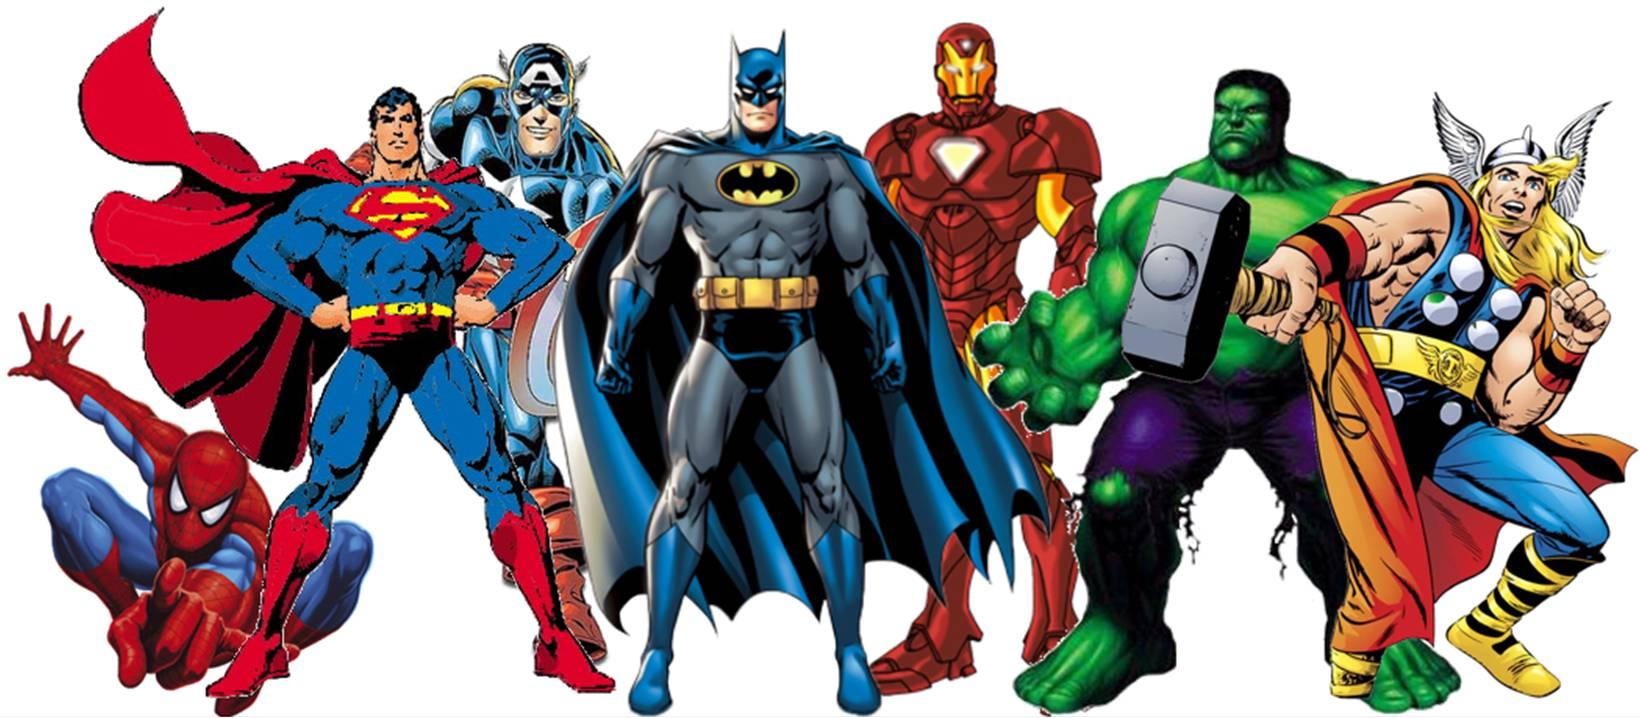 super-heroes-trivia-category-comic-trivia-night.jpg